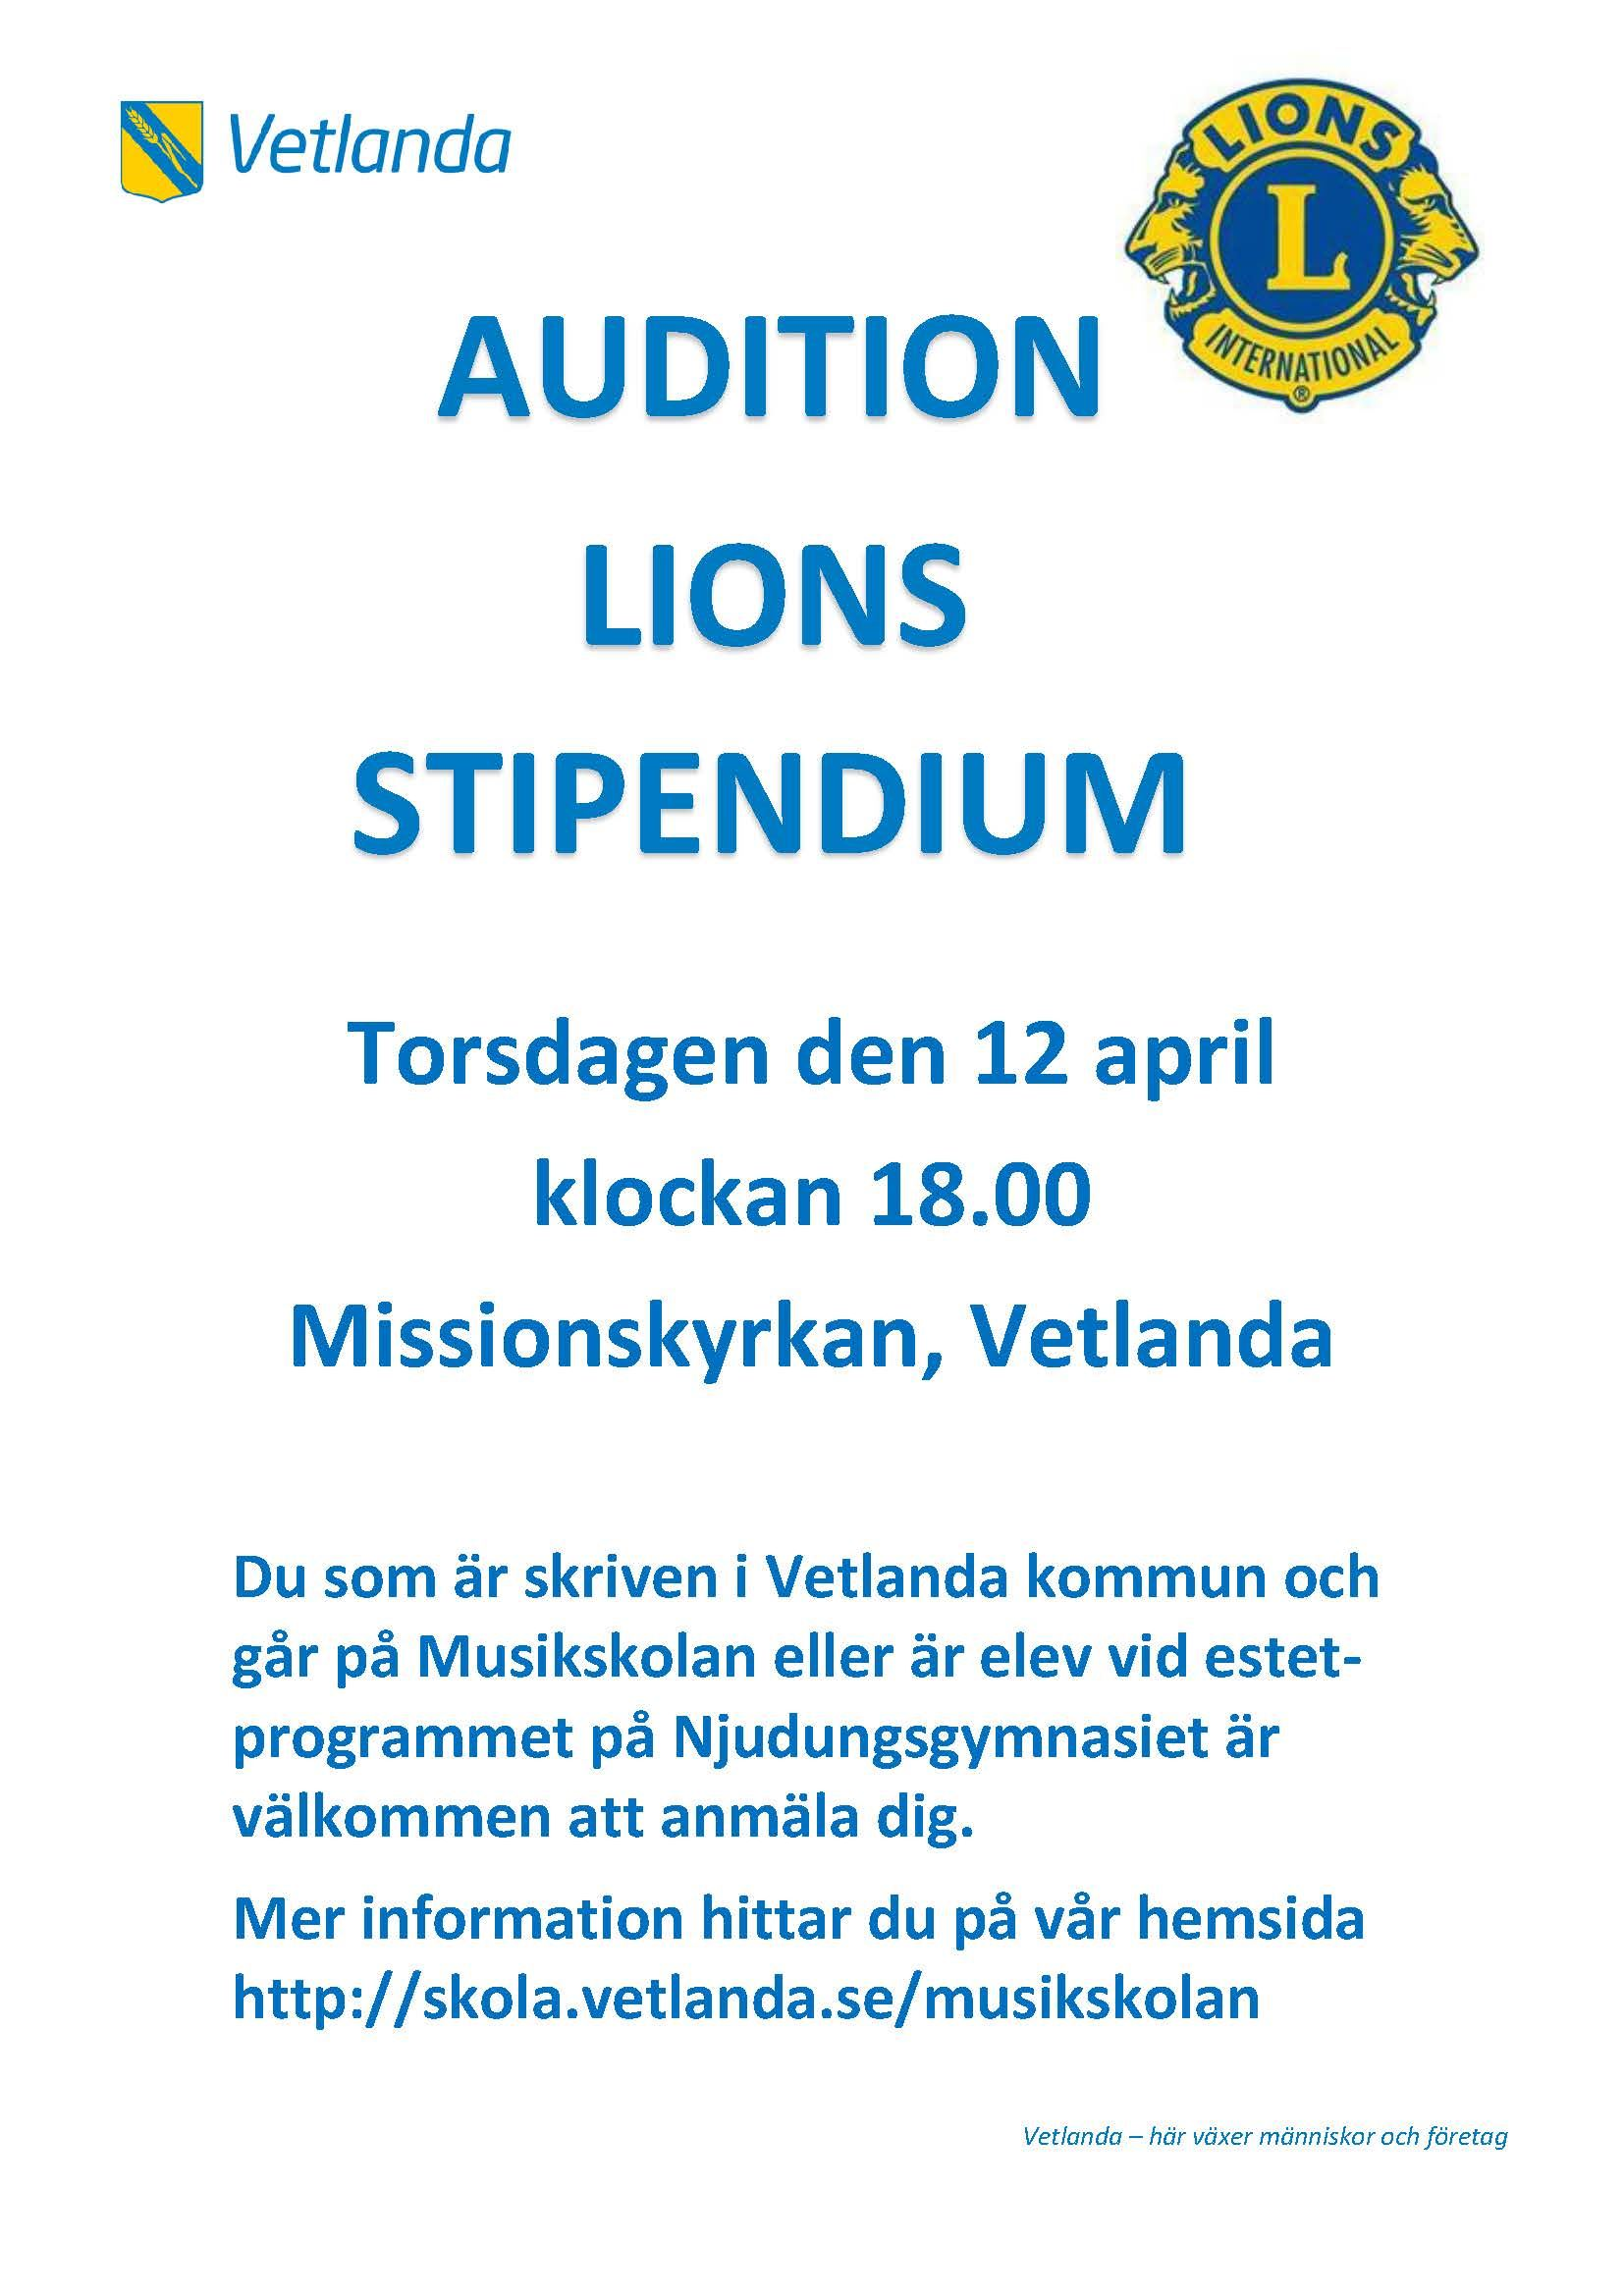 Audition Lions Stipendium